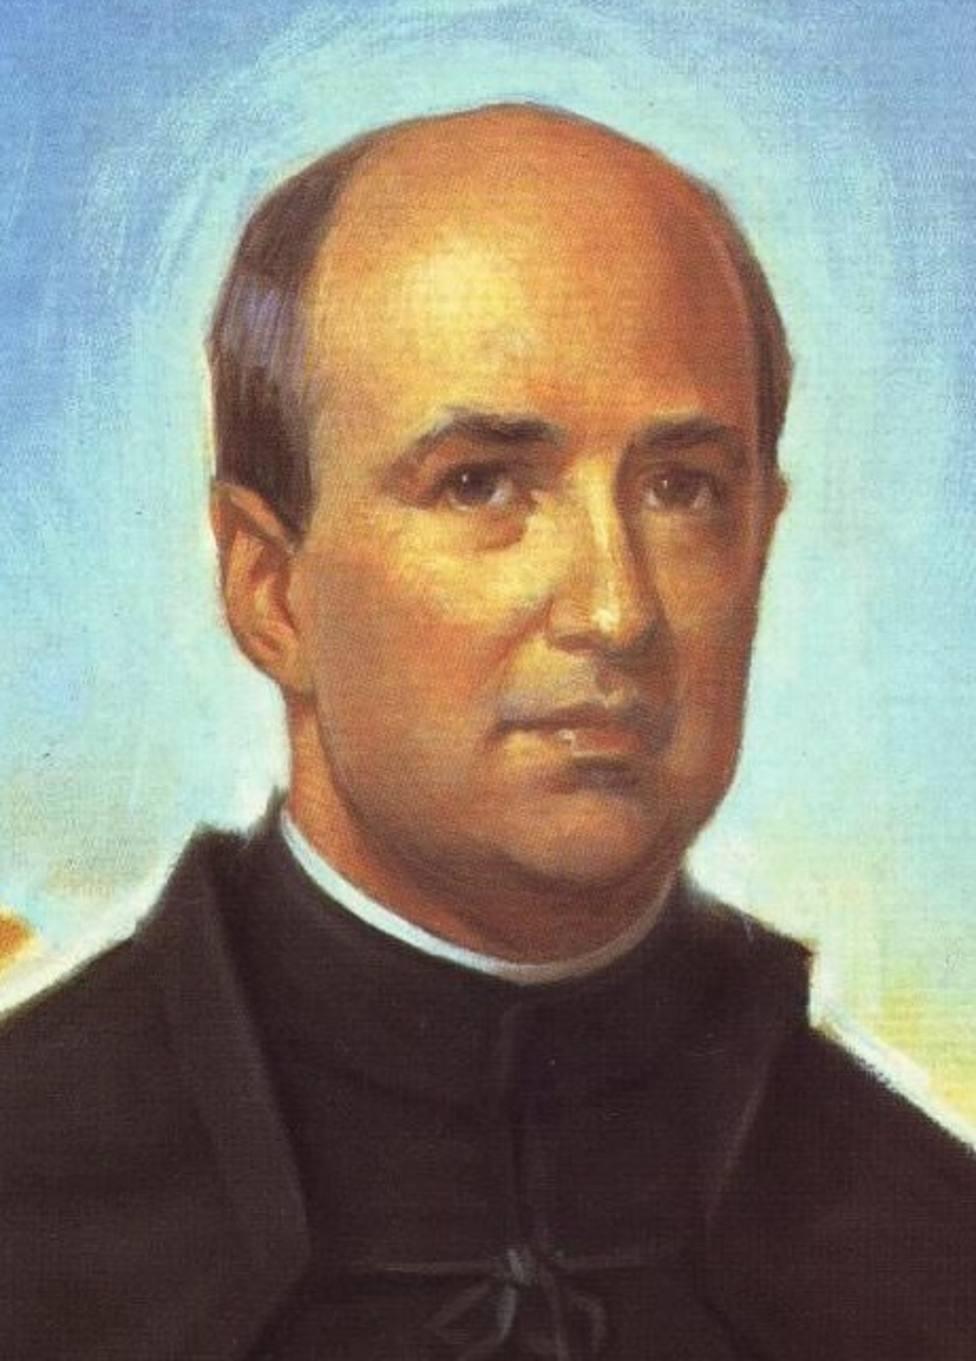 San Enrique de Ossó: Santo transmisor de la Palabra por la enseñanza